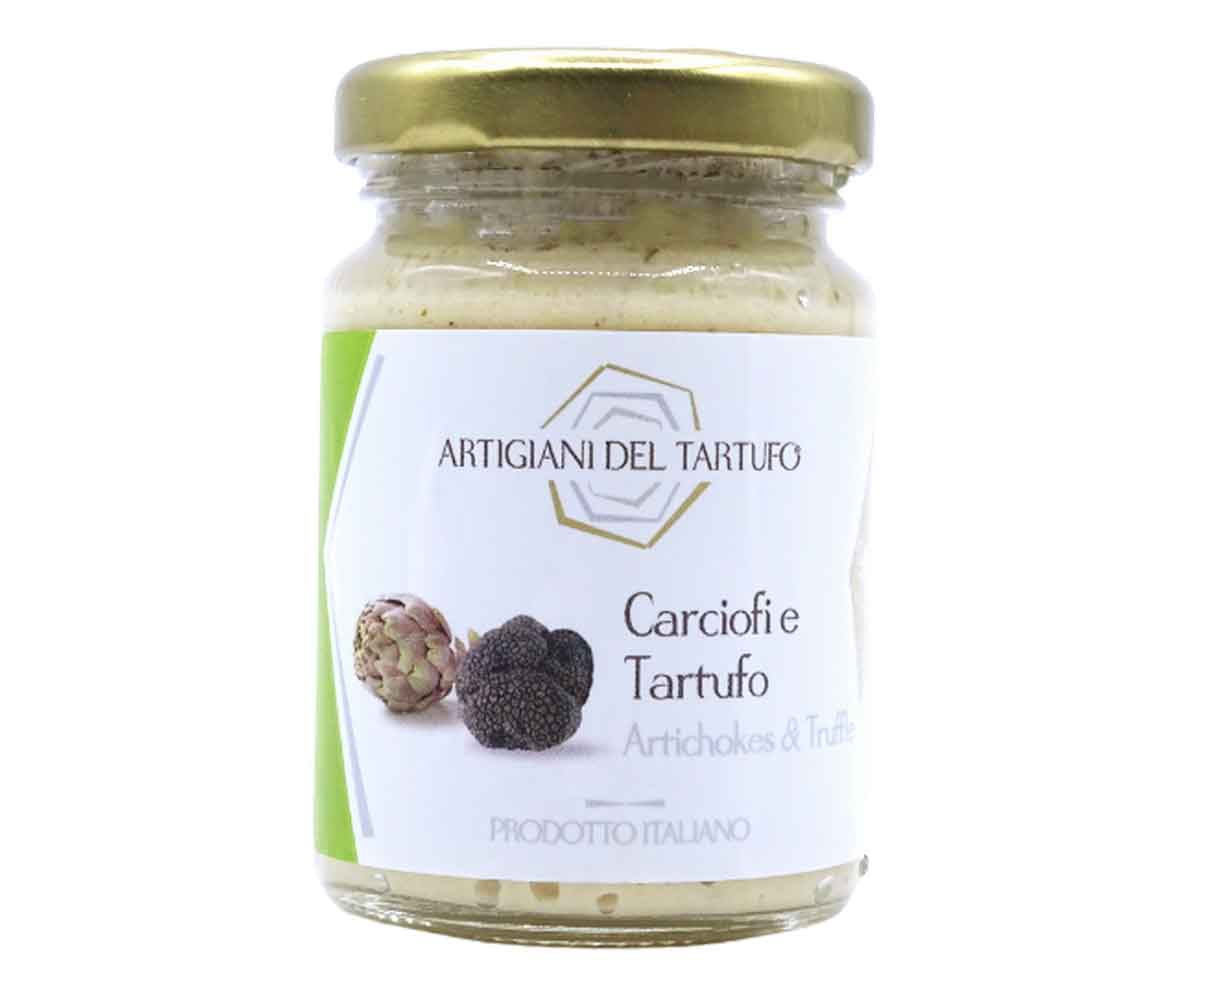 Crema di carciofi e tartufo estivo Artigiani del Tartufo 90gr